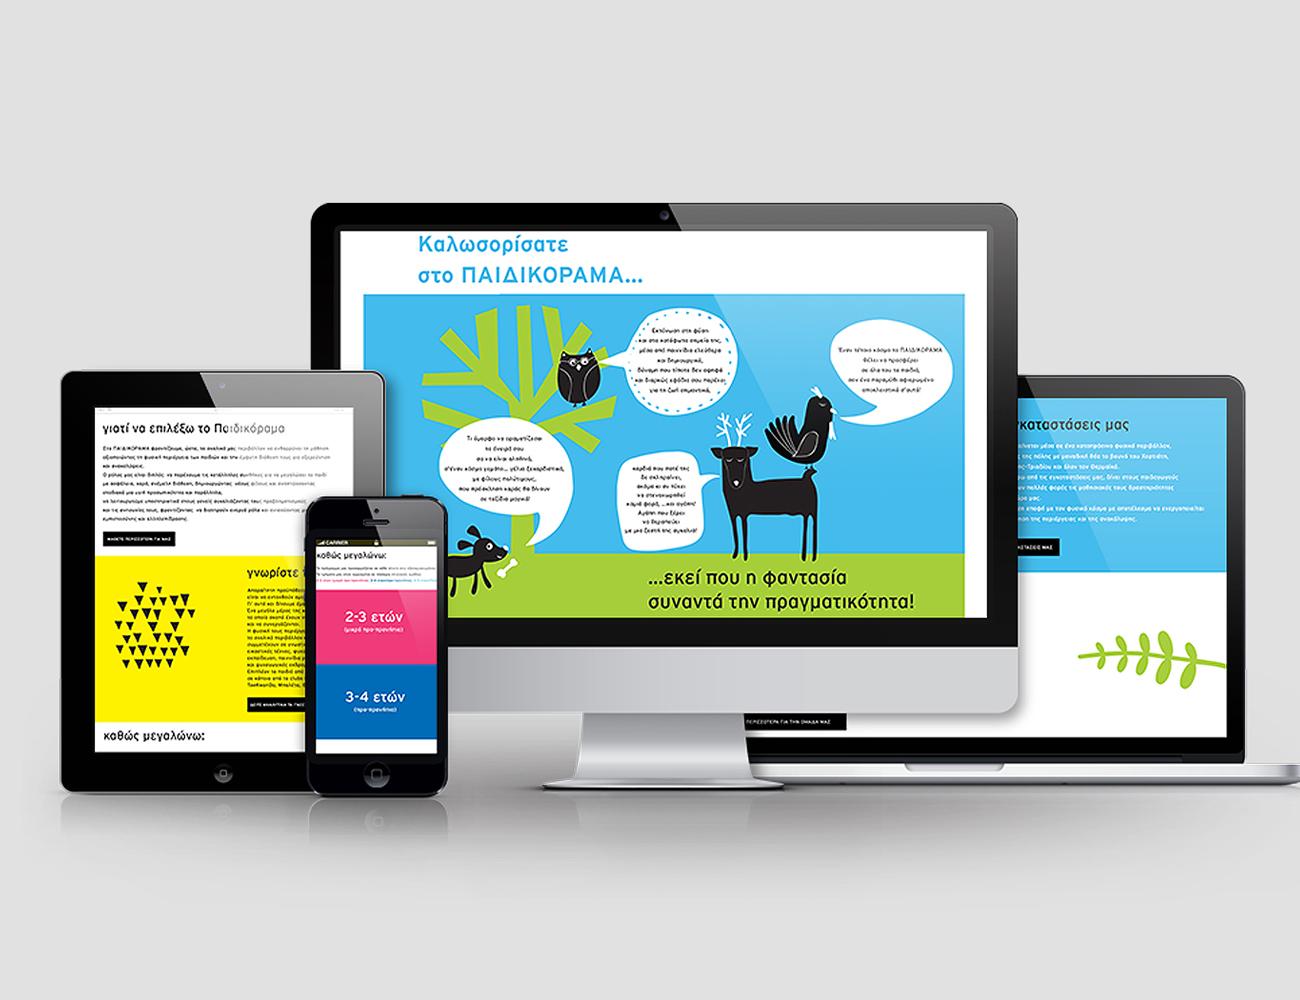 paidikoramawebsitedesign